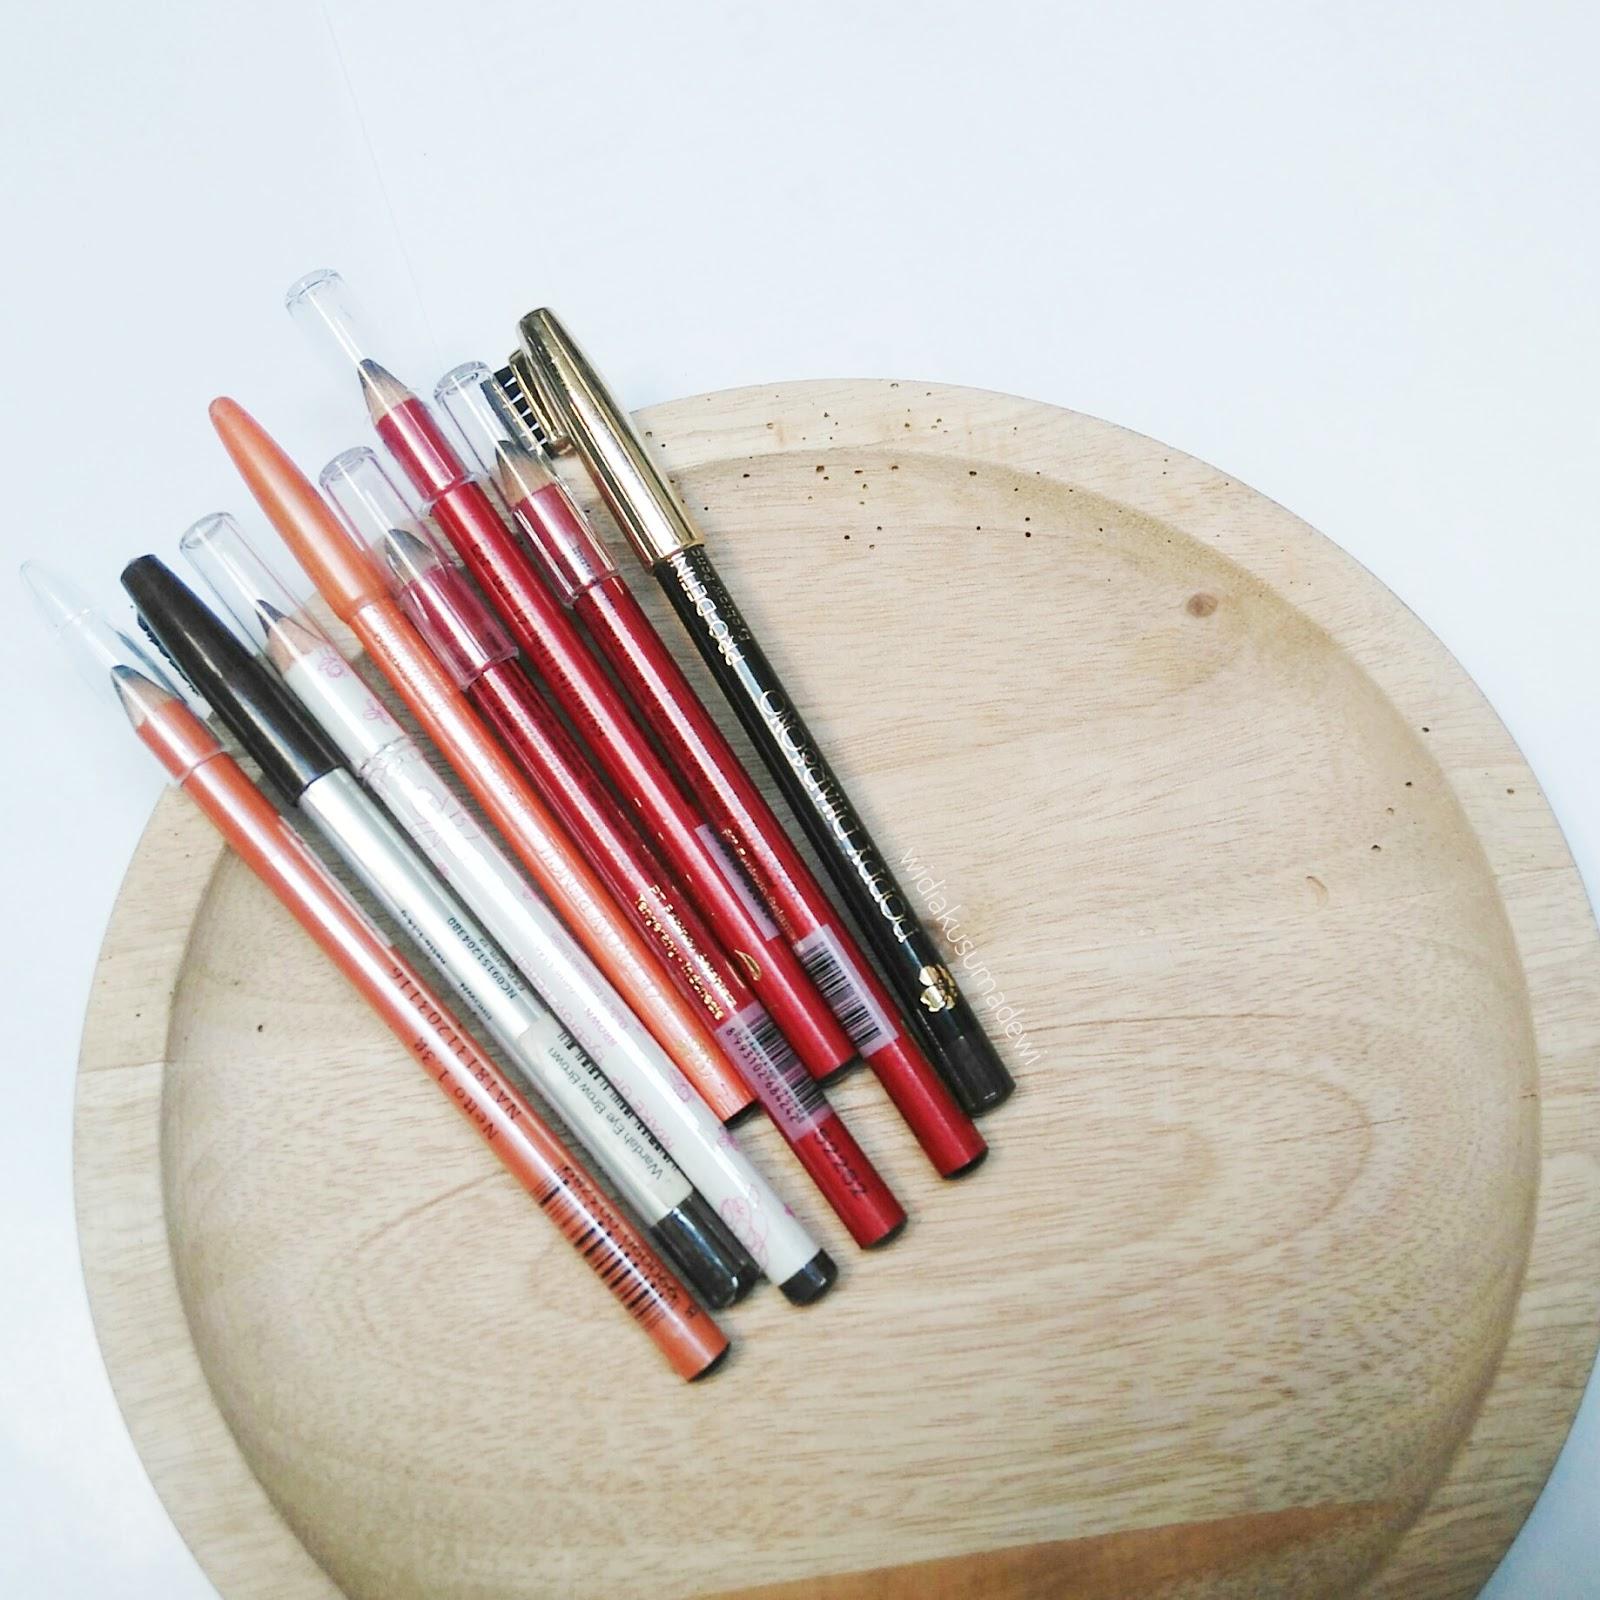 Okay kita mulai dari produk lokal yang pensil alisnya fenomenal Siapa lagi kalau bukan Viva Cosmetics Sesuai dengan namanya dia berbentuk pensil dan